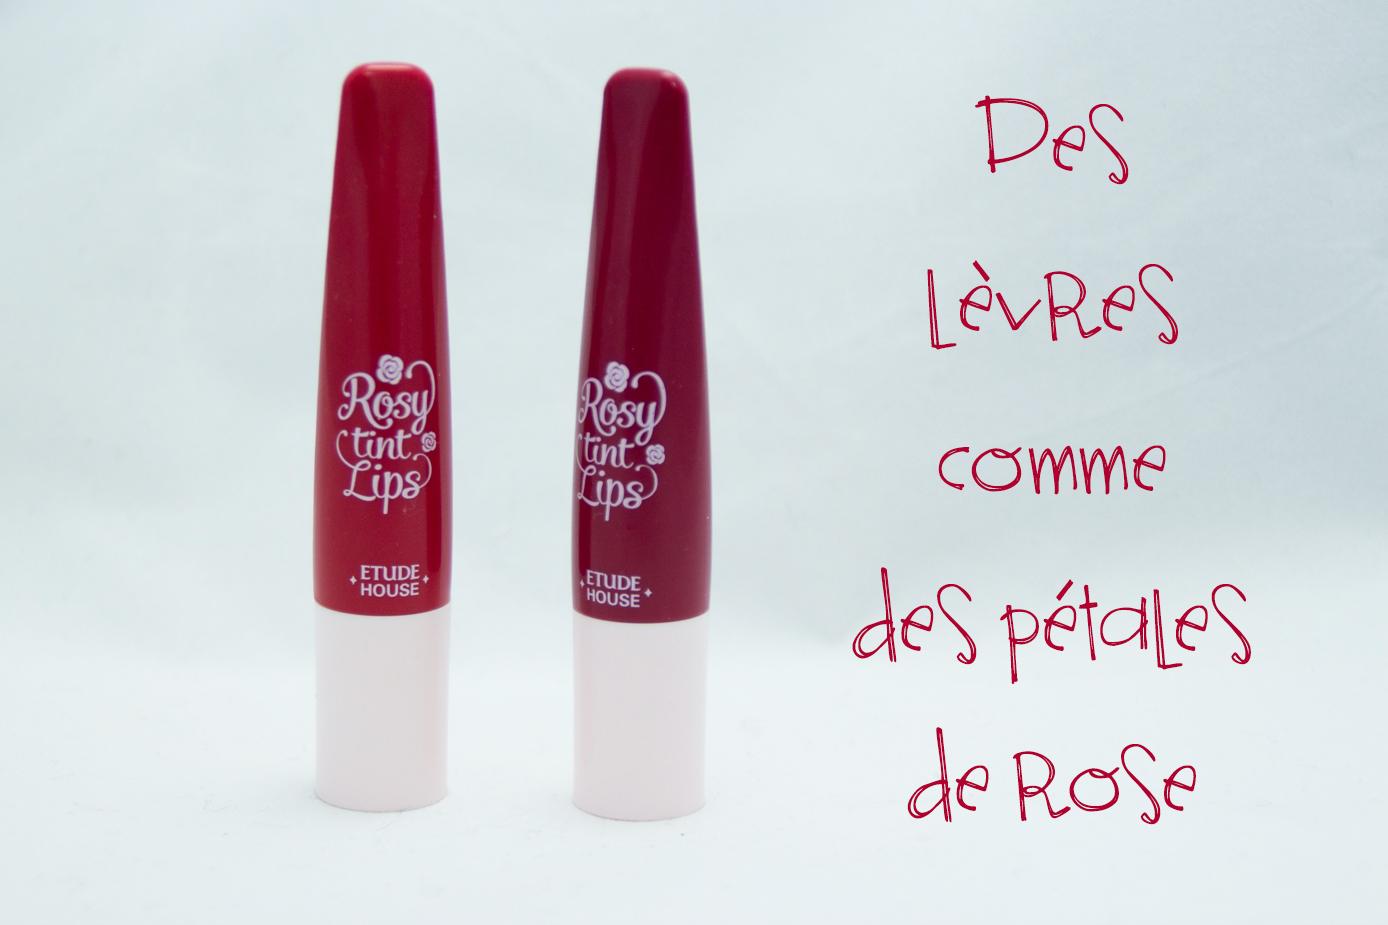 Rosy-tint-lips-10